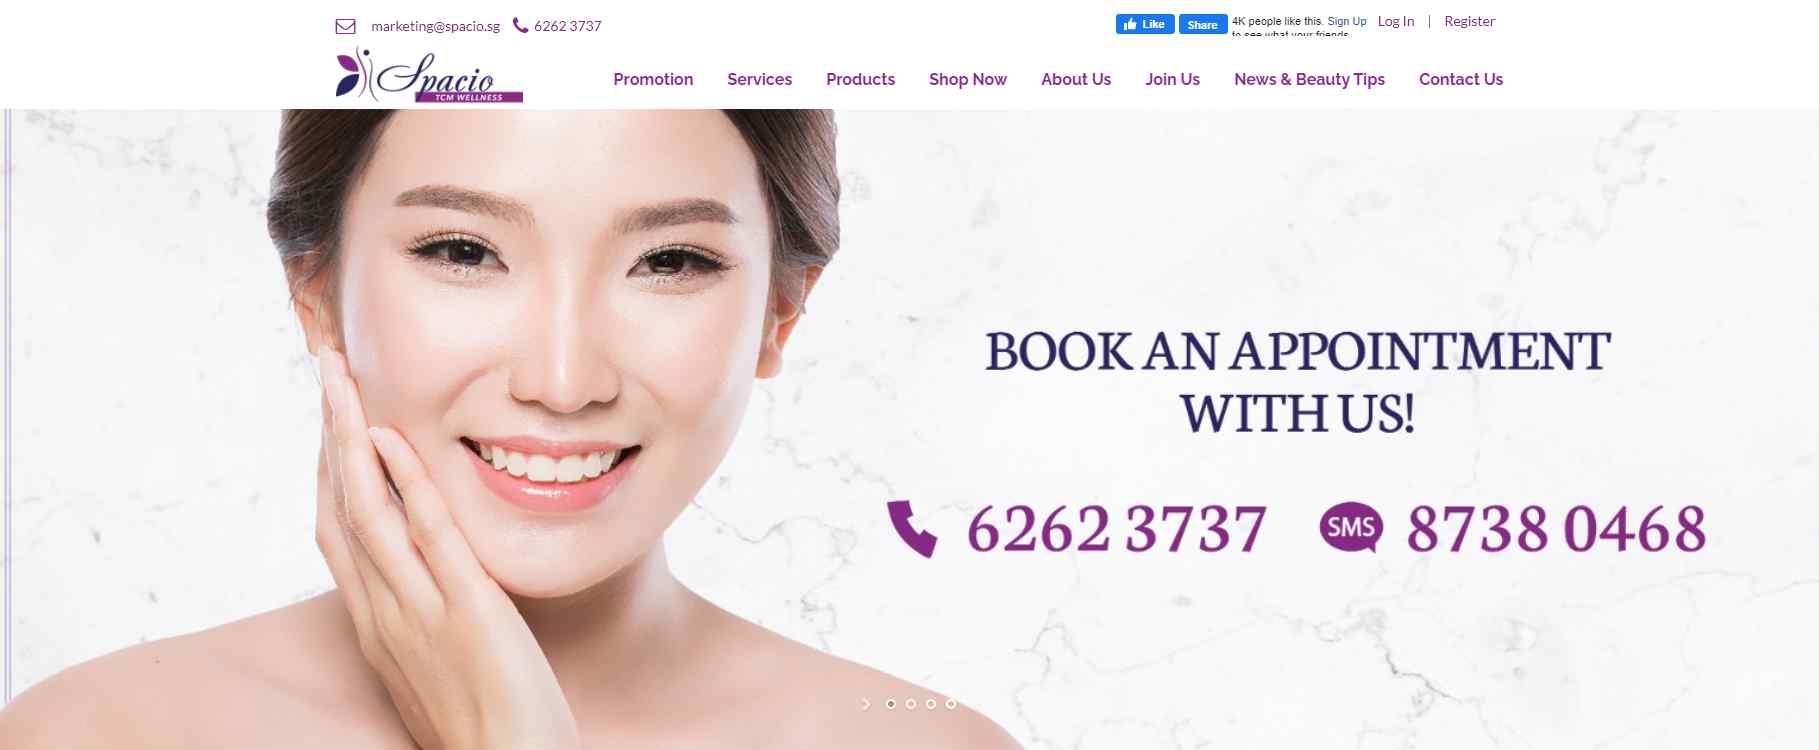 spacio Top Deep Tissue Massage Services In Singapore